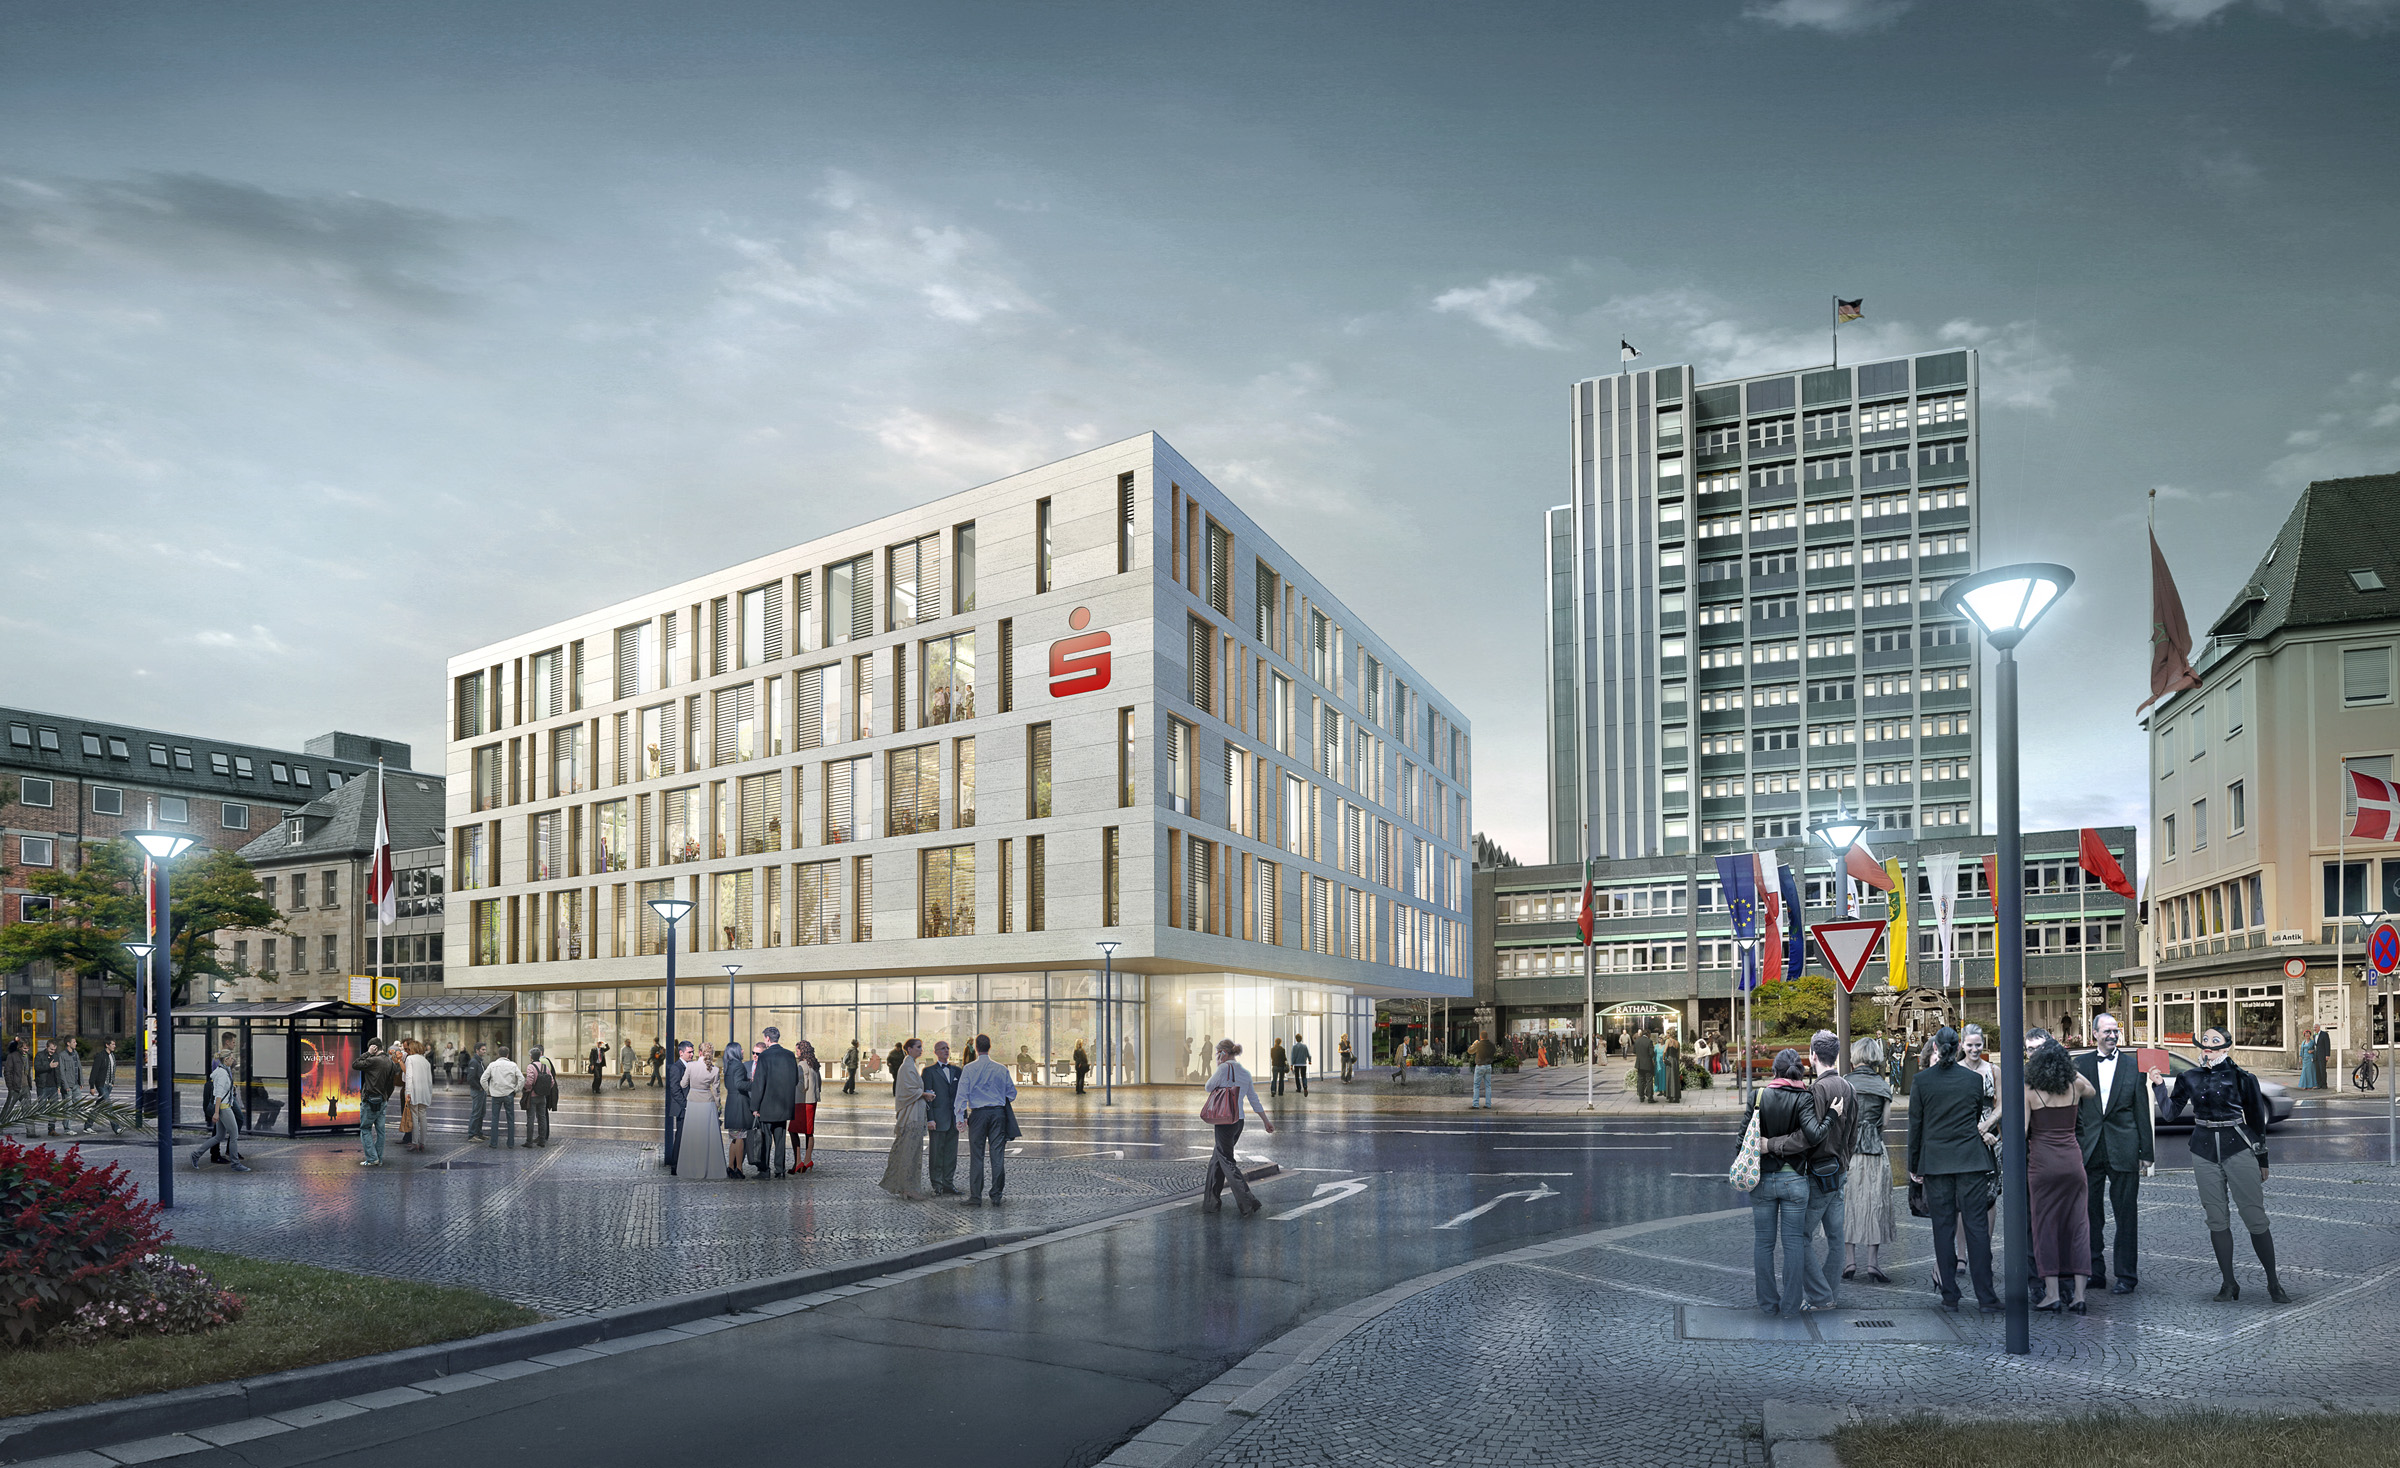 SPARKASSE BANK CONCEPT  Bayreuth, Germany |  Image courtesy of wöhr heugenhauser architekten